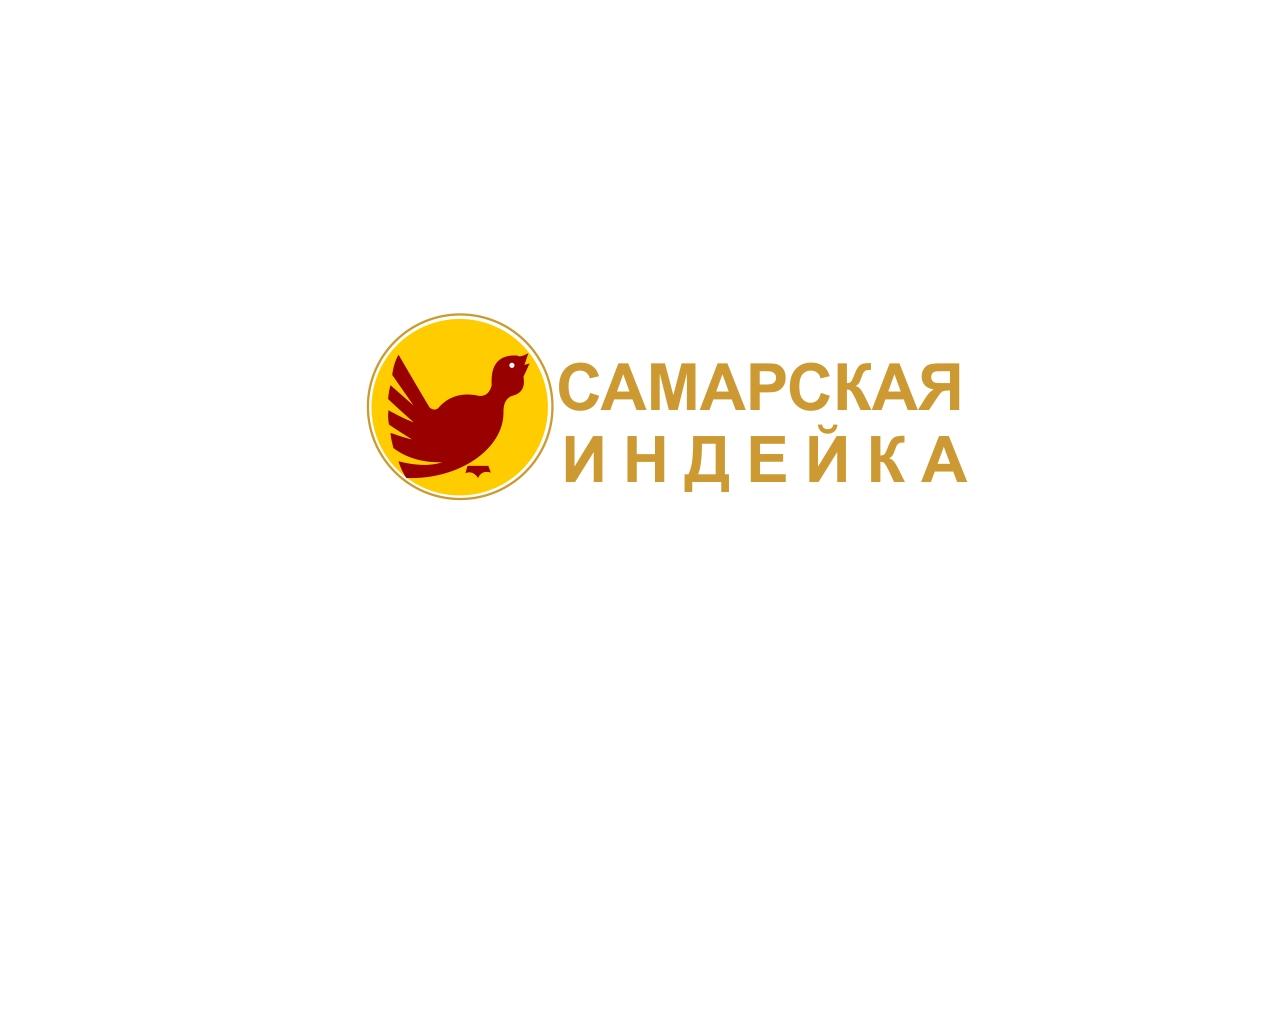 Создание логотипа Сельхоз производителя фото f_69055df16928ed79.jpg